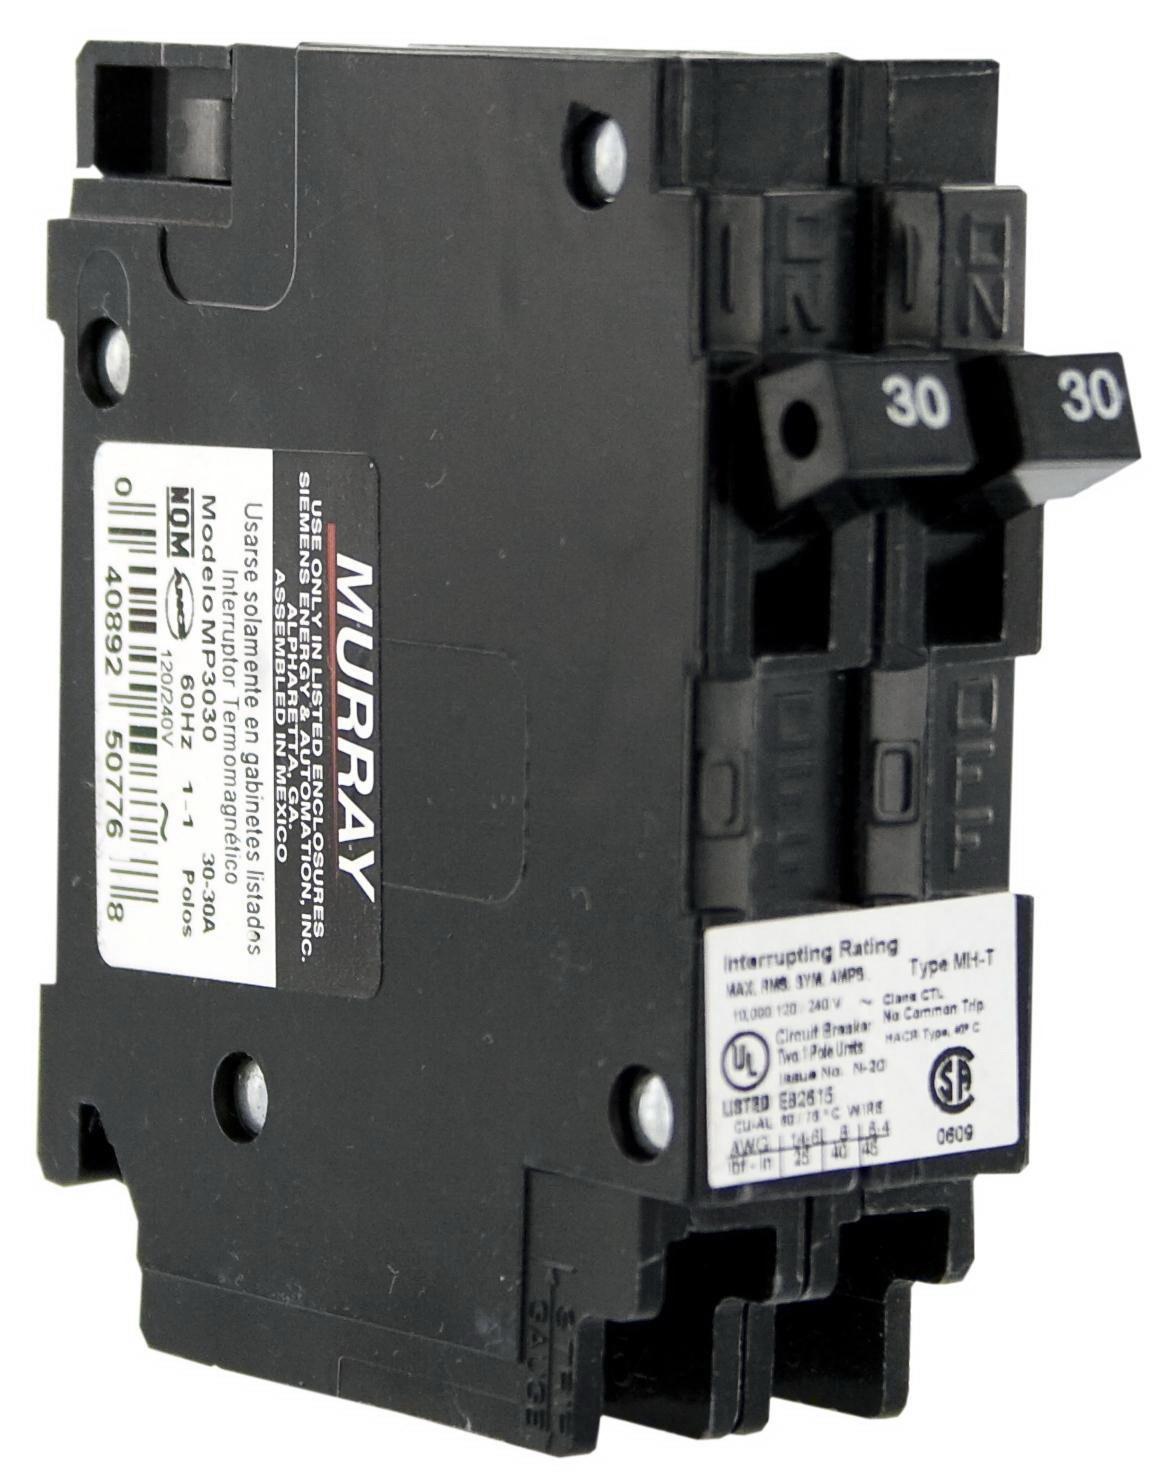 Murray MP3030 Duplex Type MH-T Circuit Breaker, 120 VAC, 30 A, 2 P, 10 kA